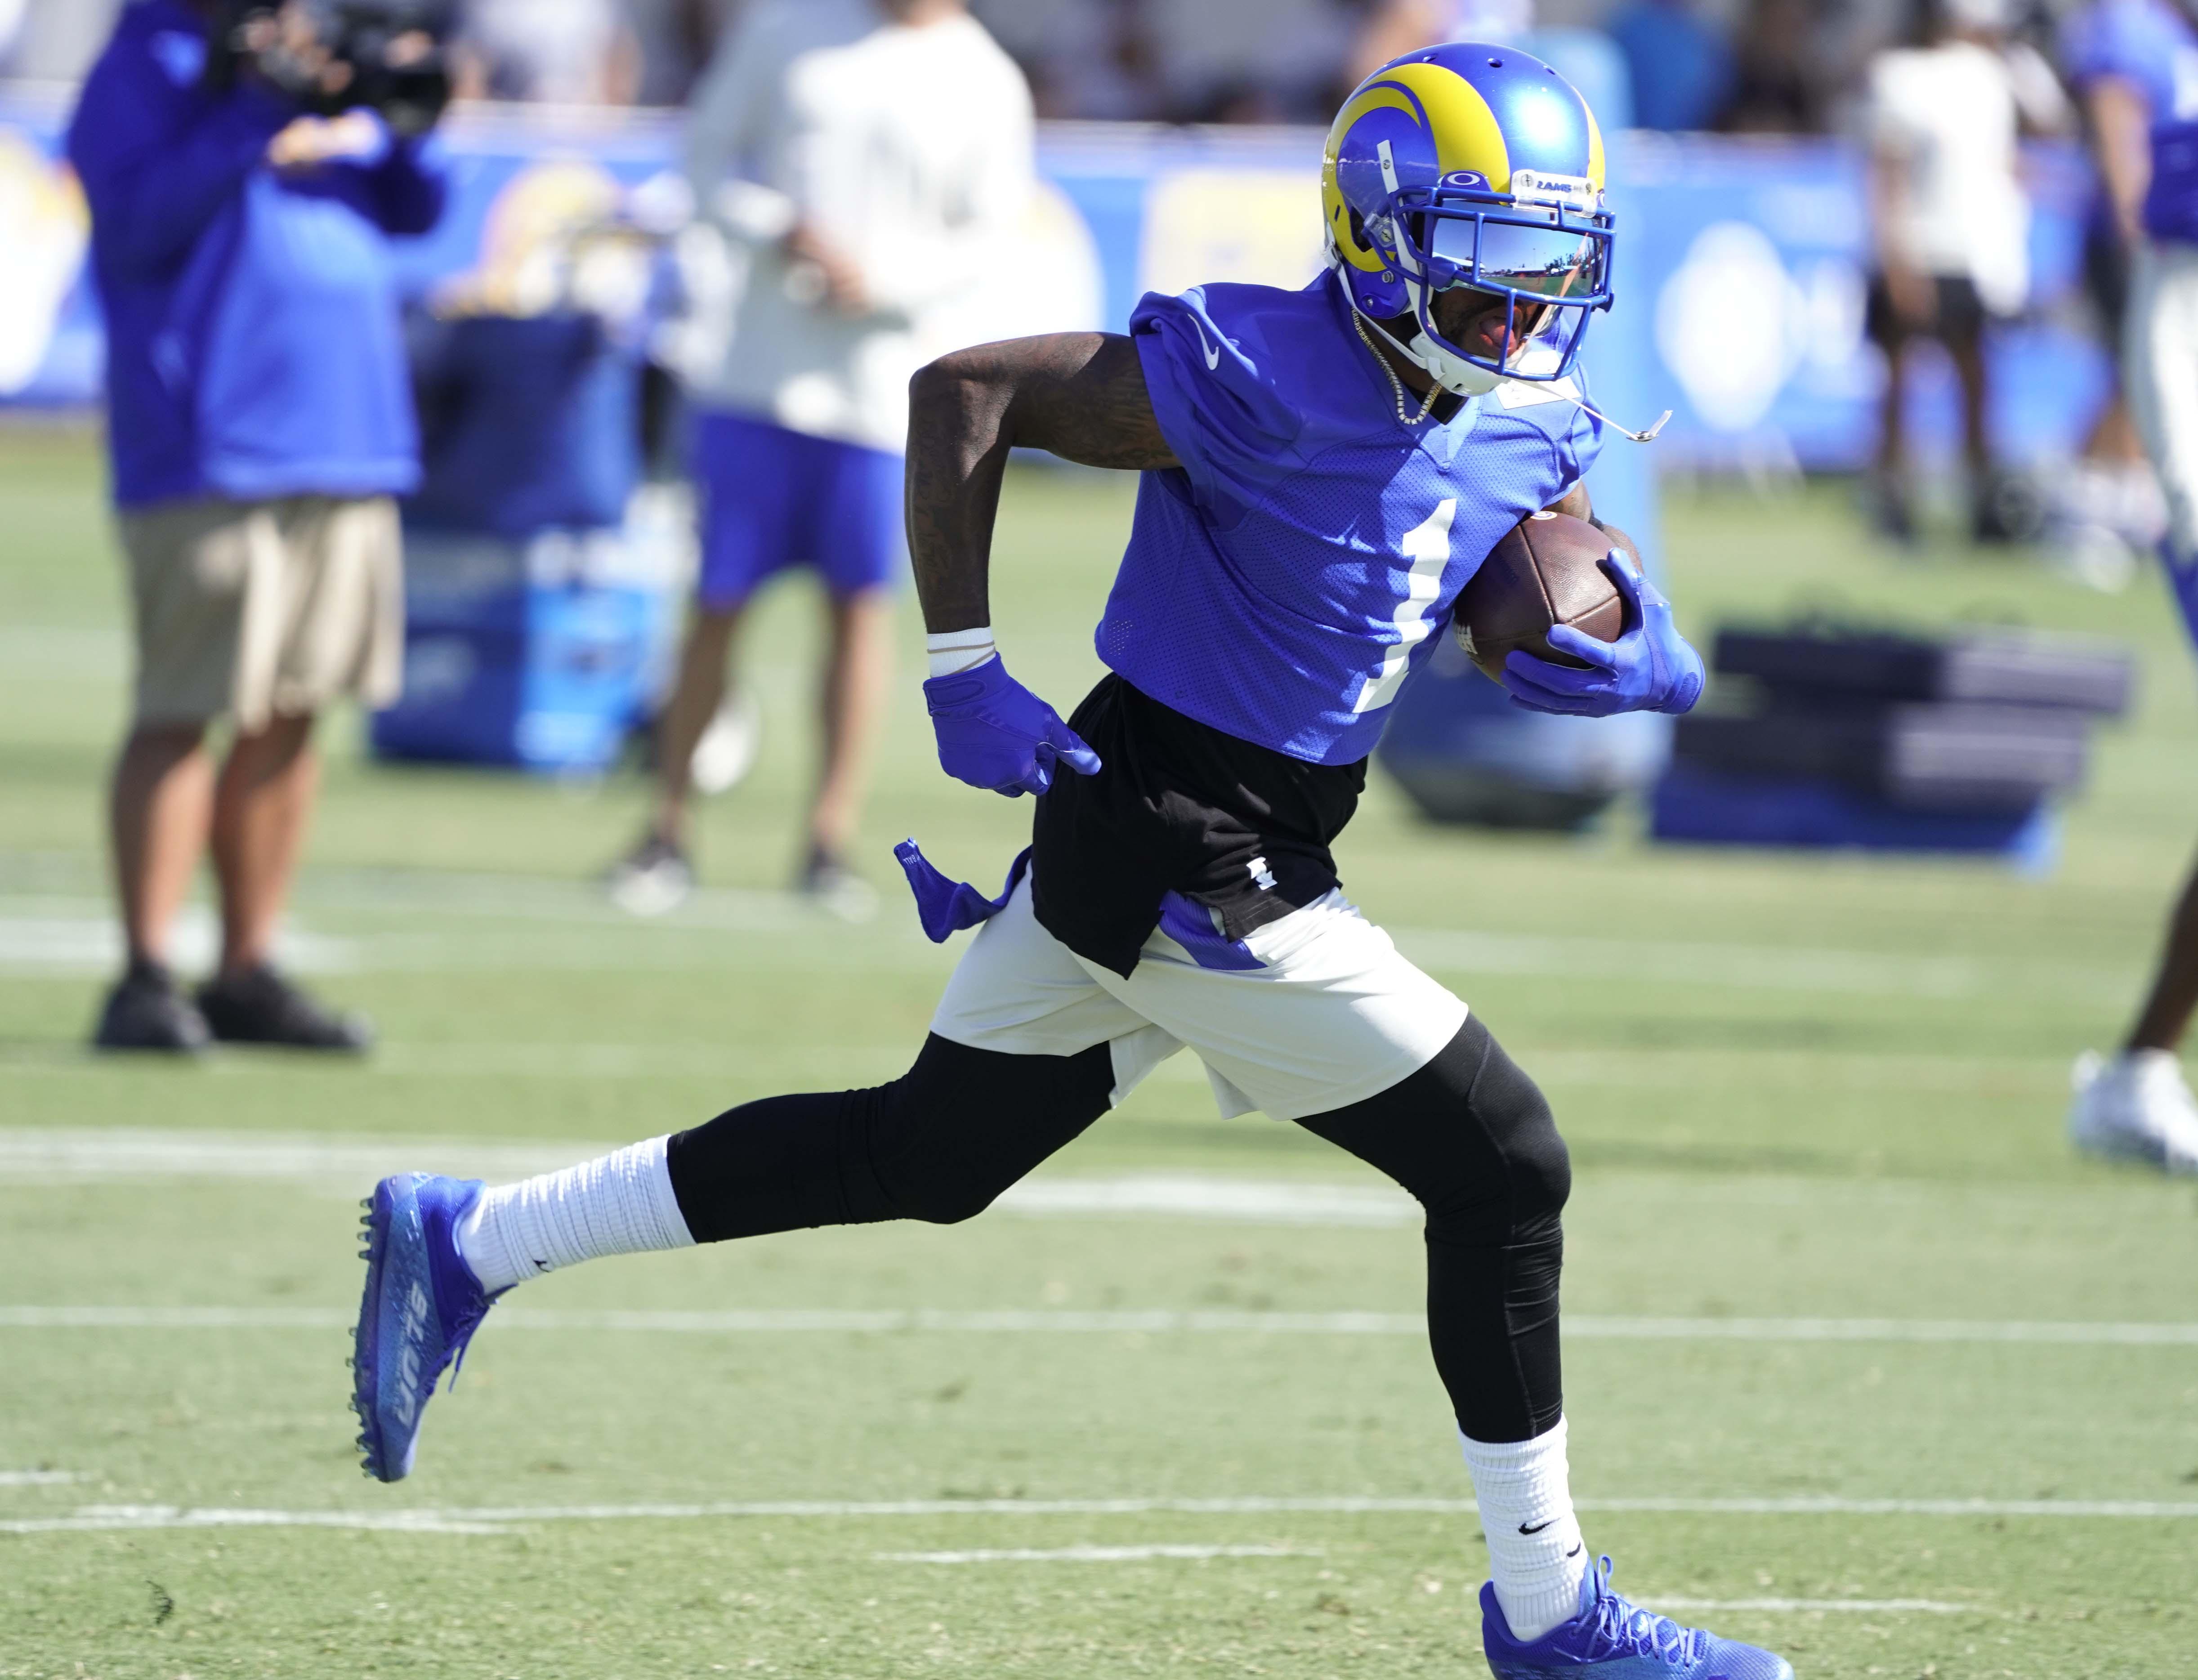 NFL: JUL 31 Los Angeles Rams Training Camp